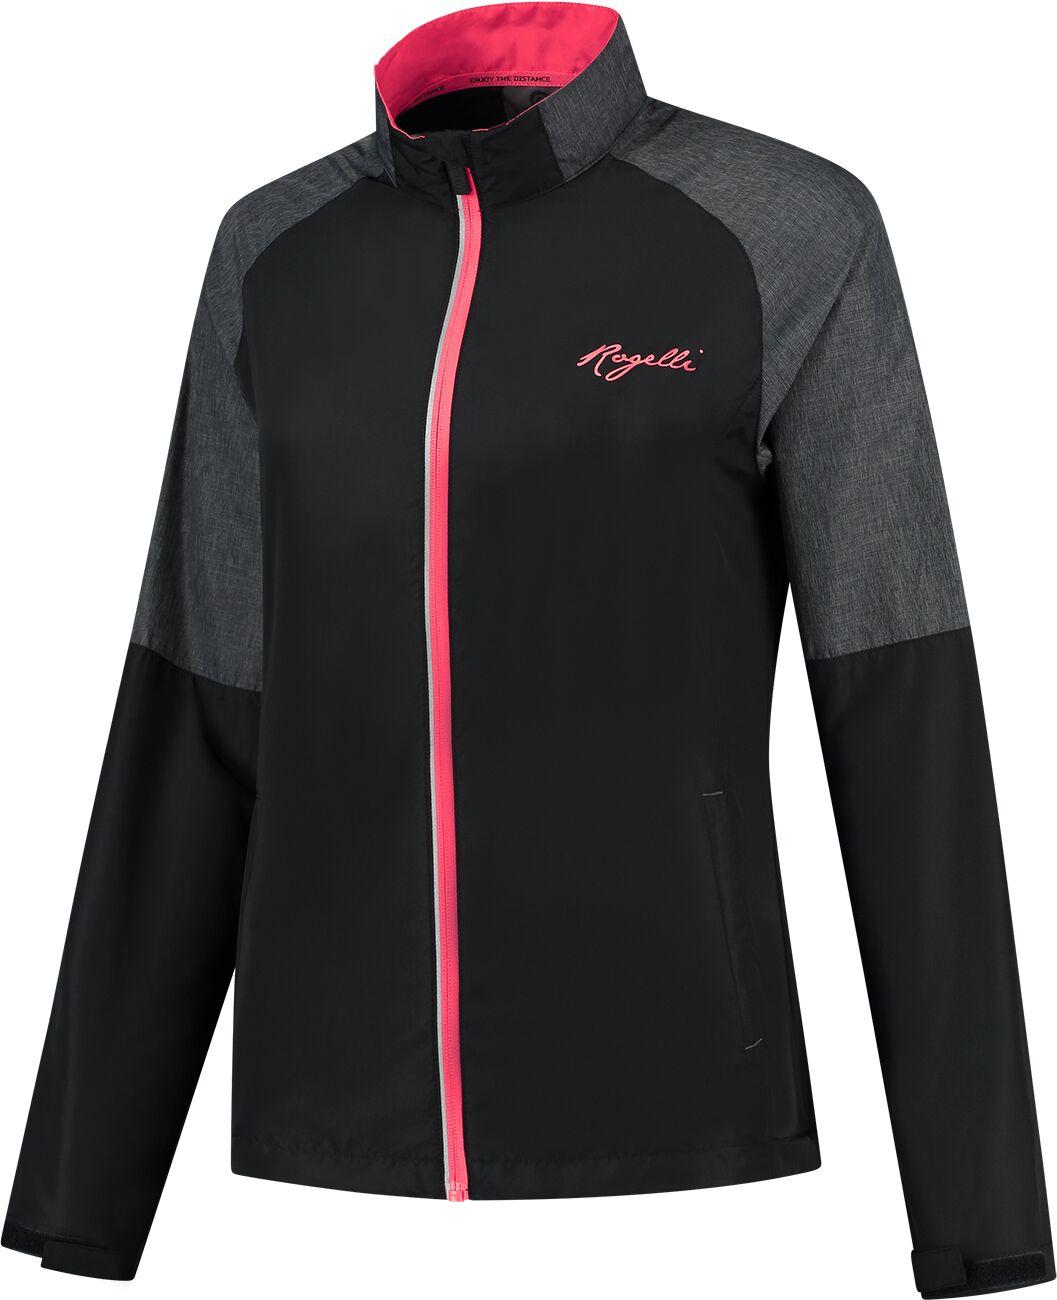 ROGELLI damska kurtka do biegania ENJOY black ROG351112 Rozmiar: M,ROG351112.XS